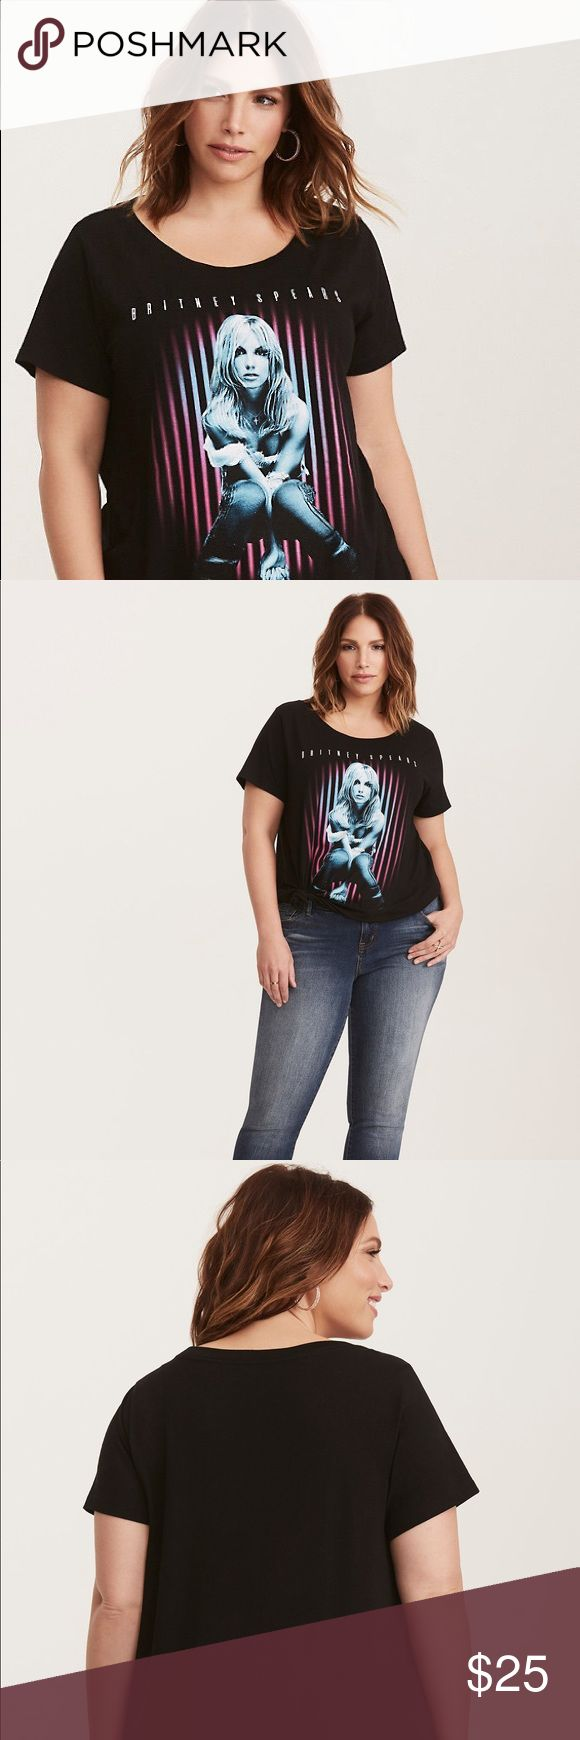 Torrid Britney Spears Tee New with tags. Torrid Brand. Britney Spears shirt.  Size 2. Cotton. Torrid Tops Tees - Short Sleeve